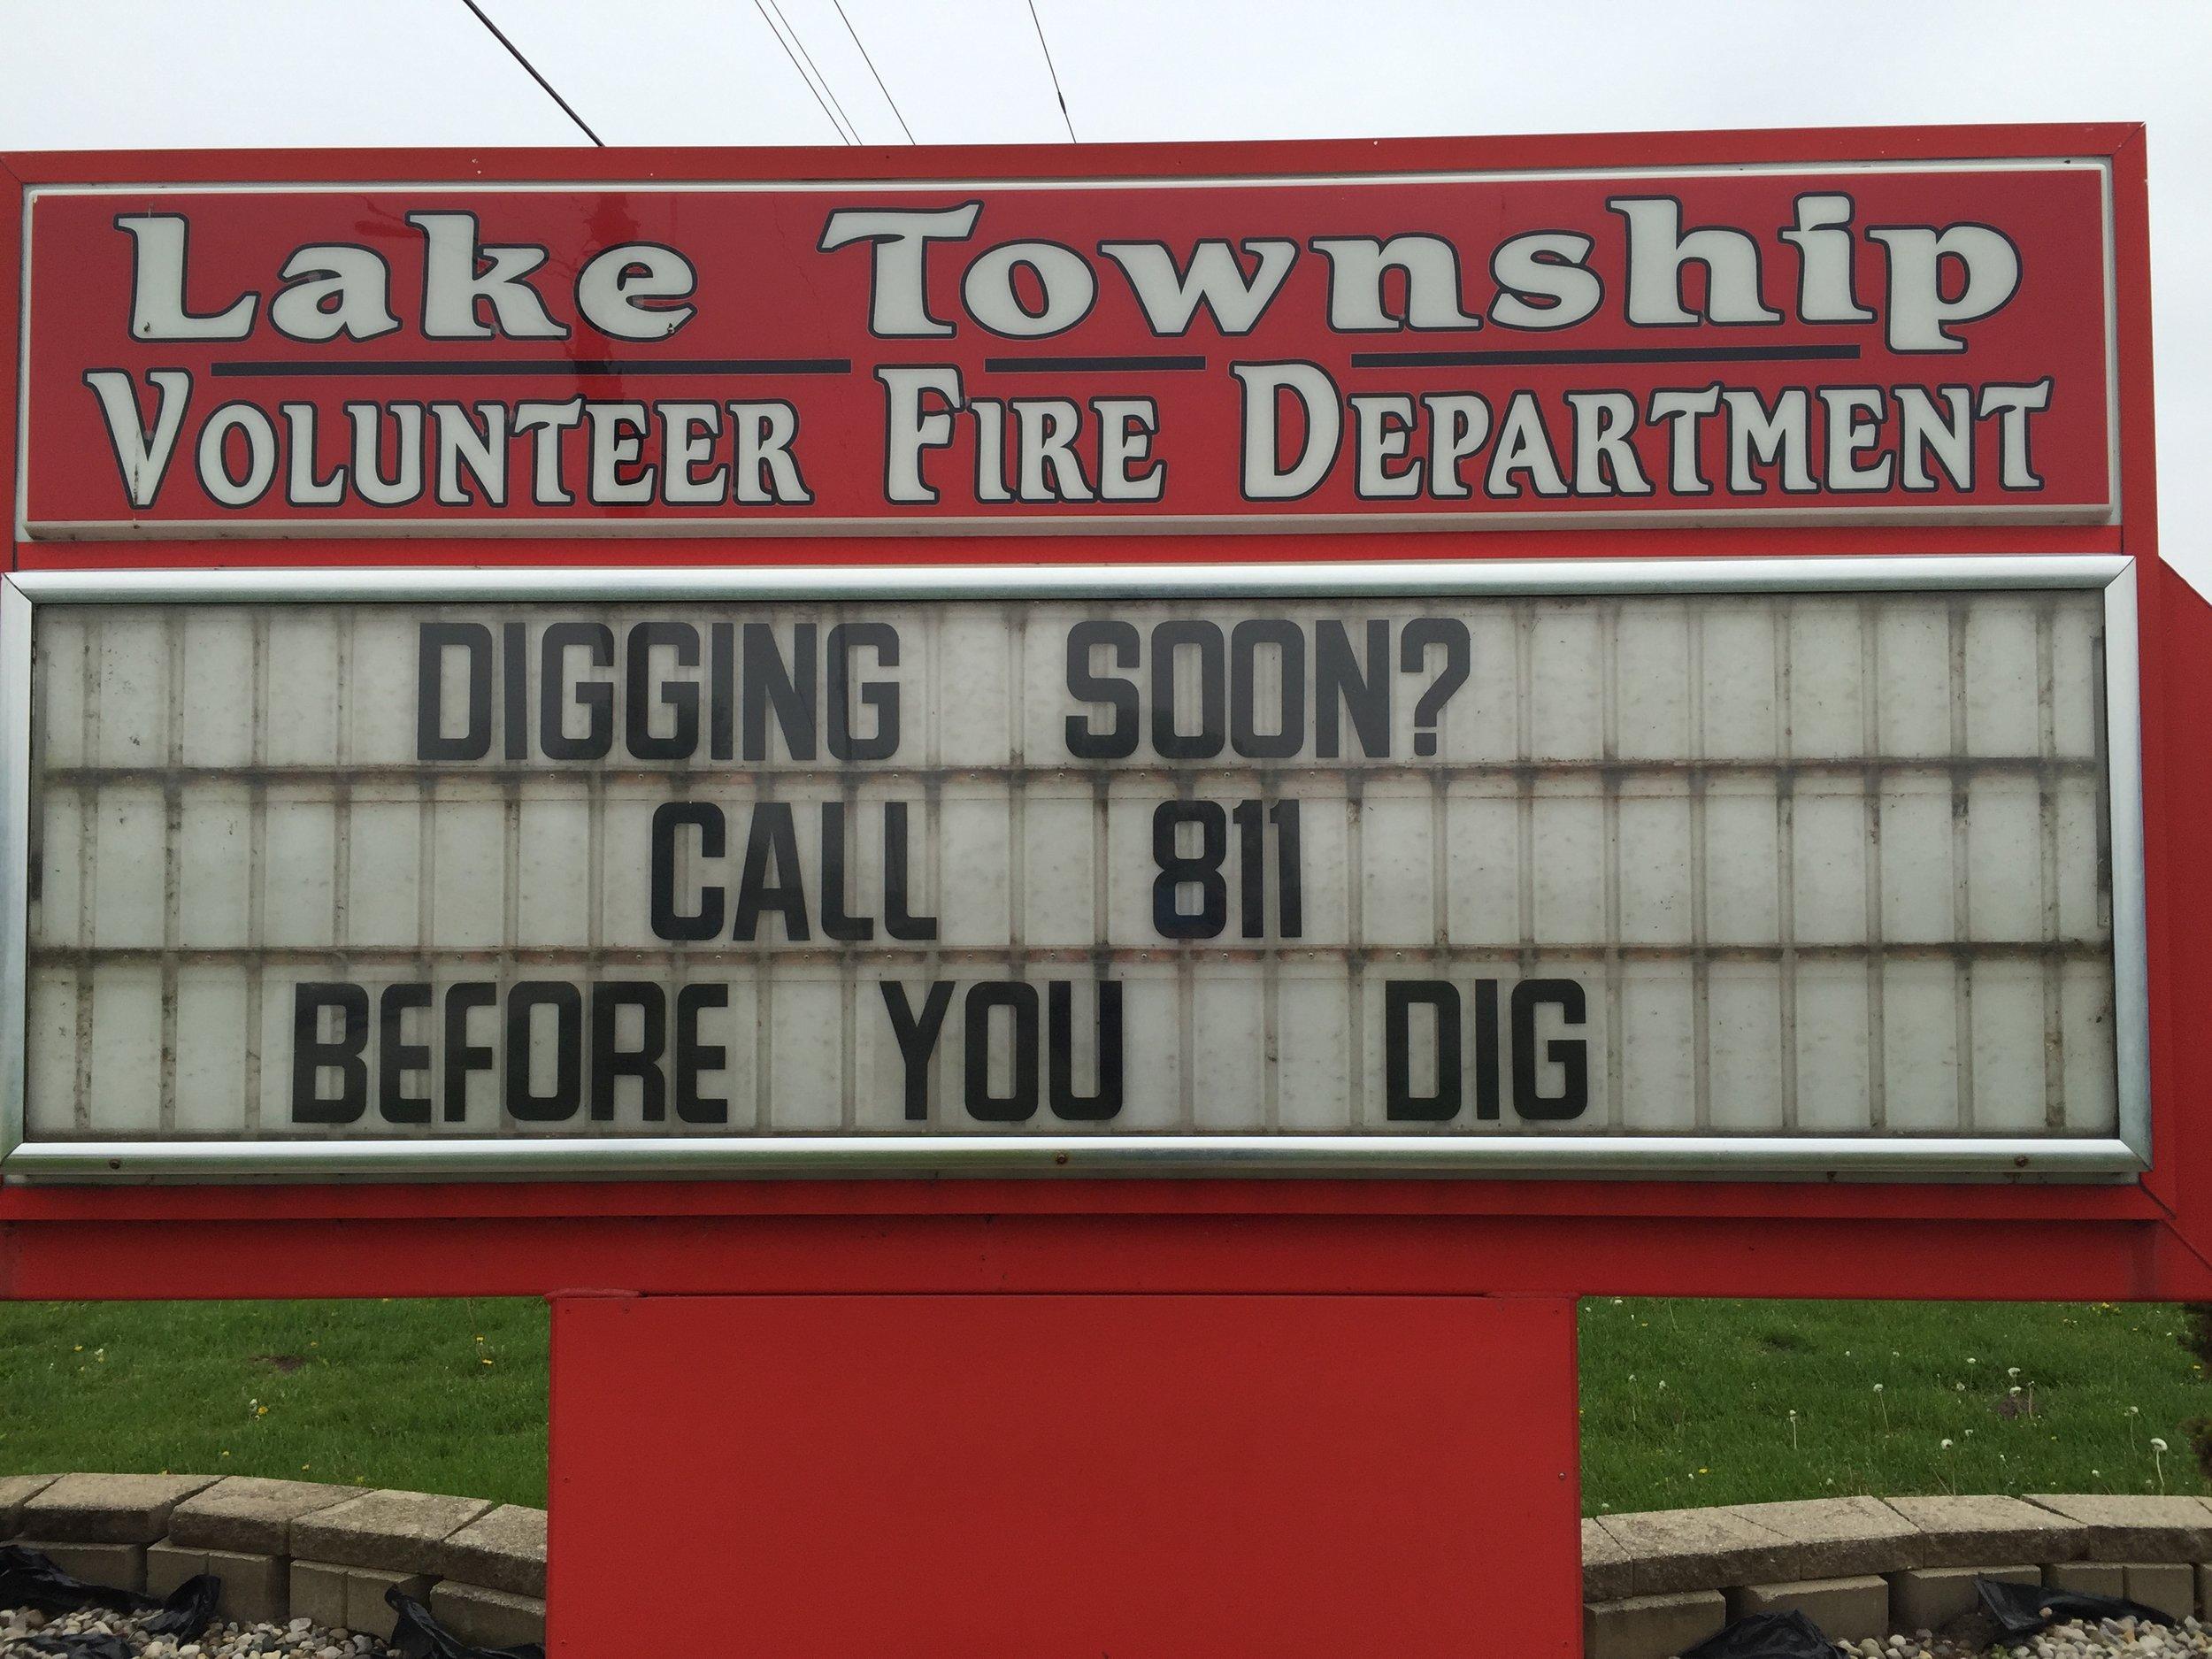 Lake Township Volunteer Fire Department